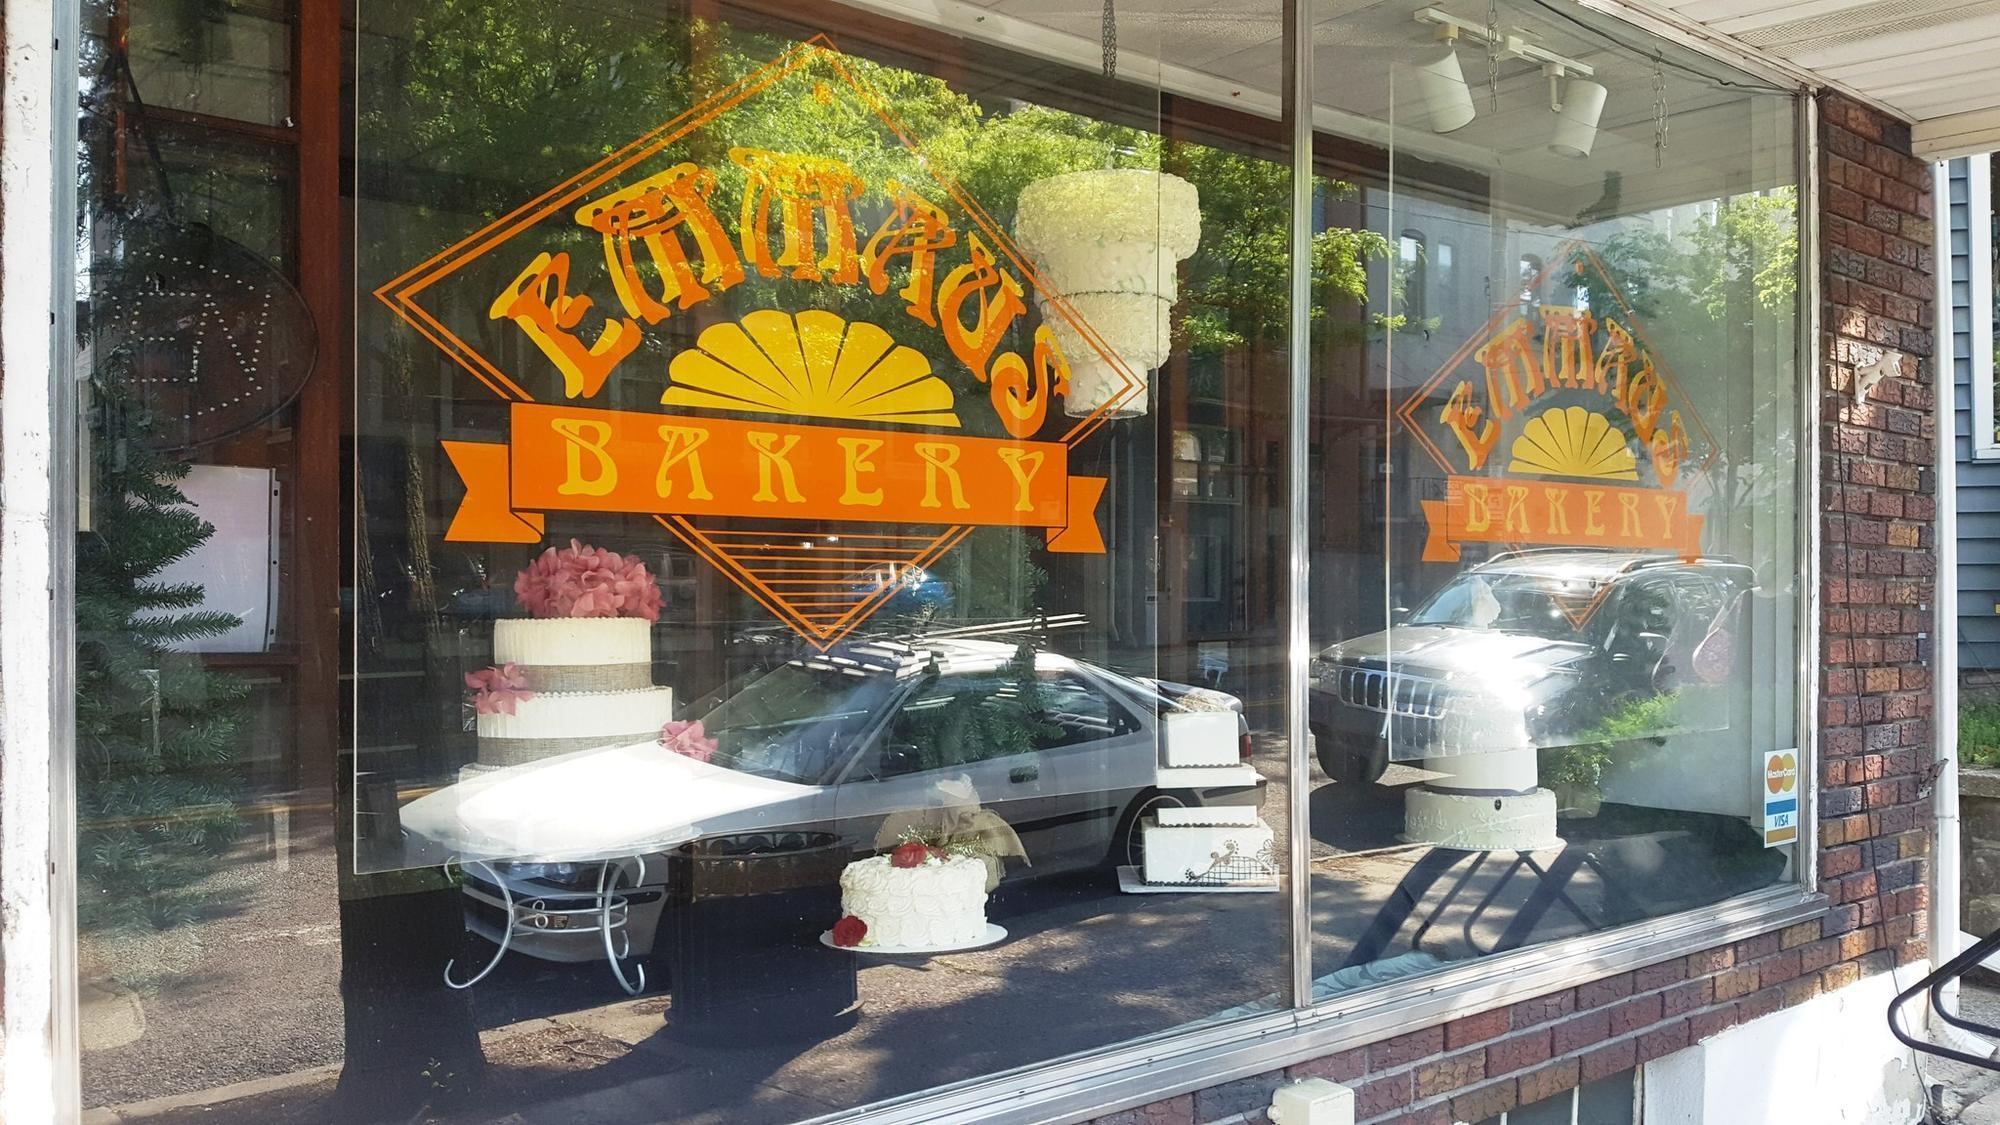 Emmaus Bakery Cakes